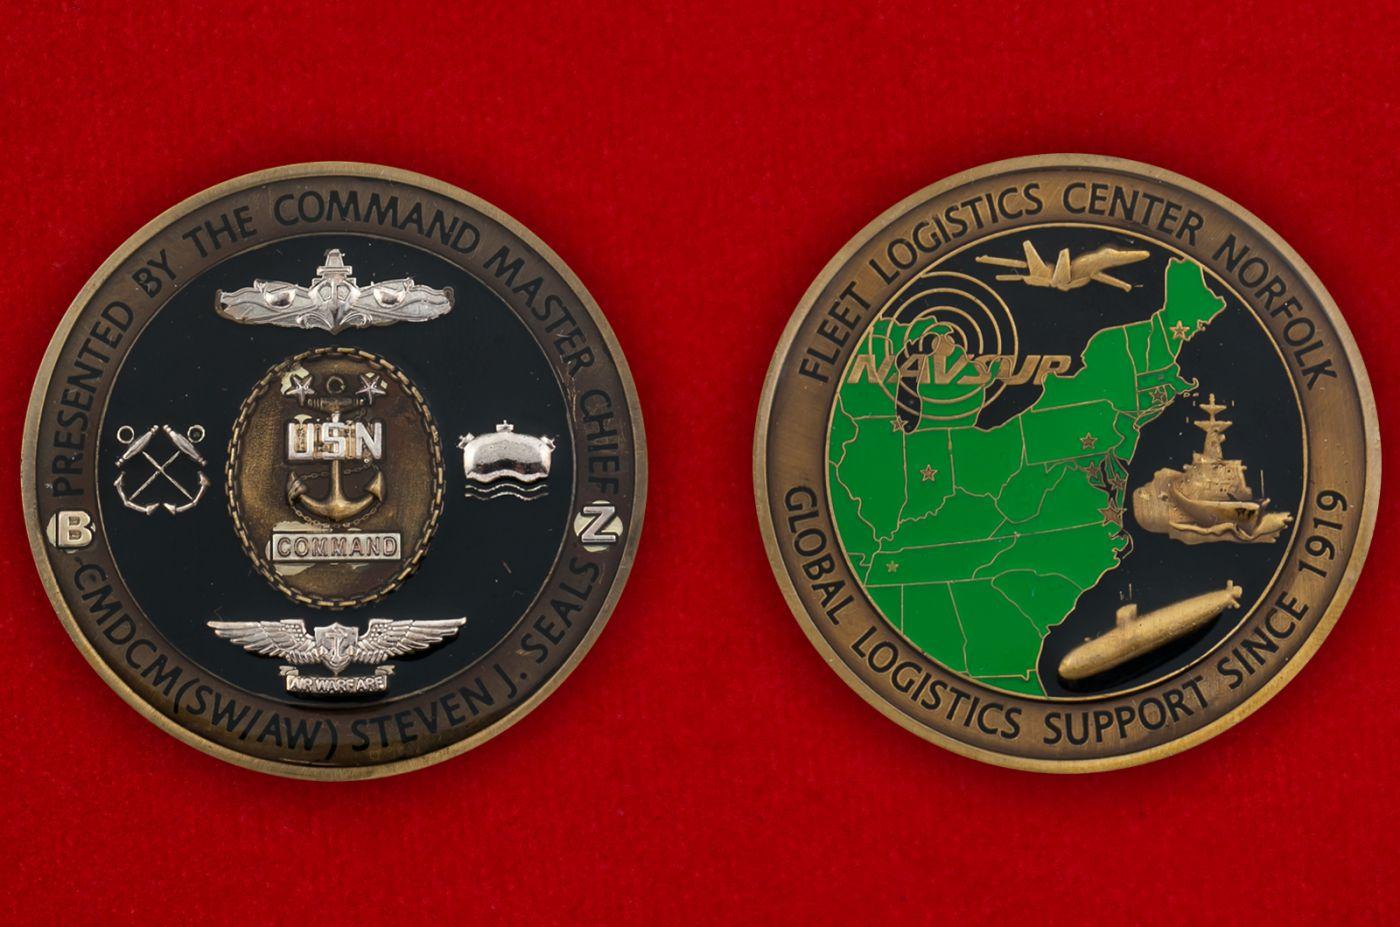 Челлендж коин Команд-мастер-сержанта Береговой охраны США Стивена Сайлса - аверс и реверс